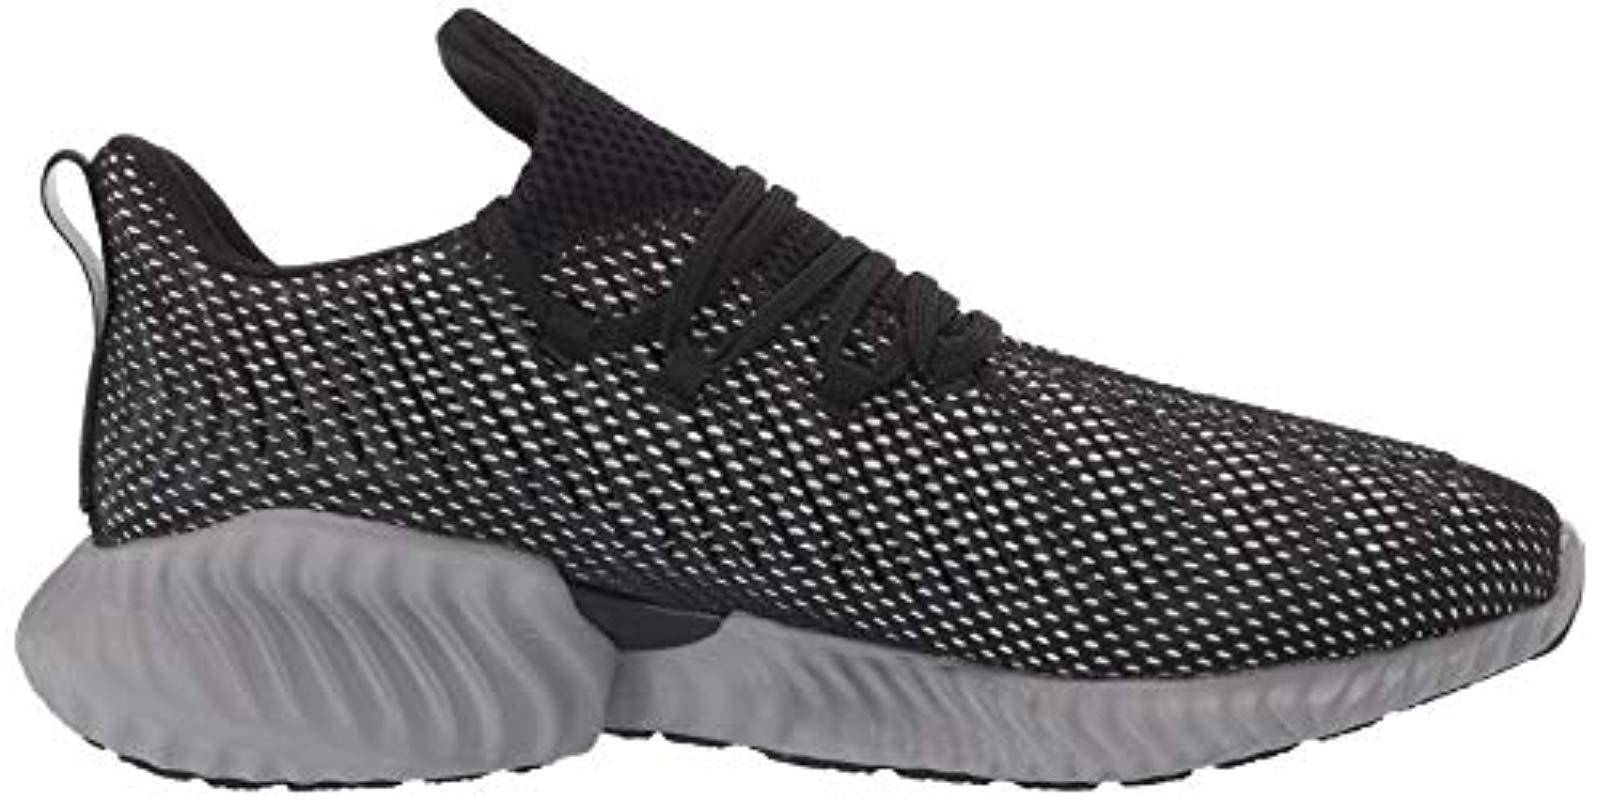 adidas alphabounce instinct black white